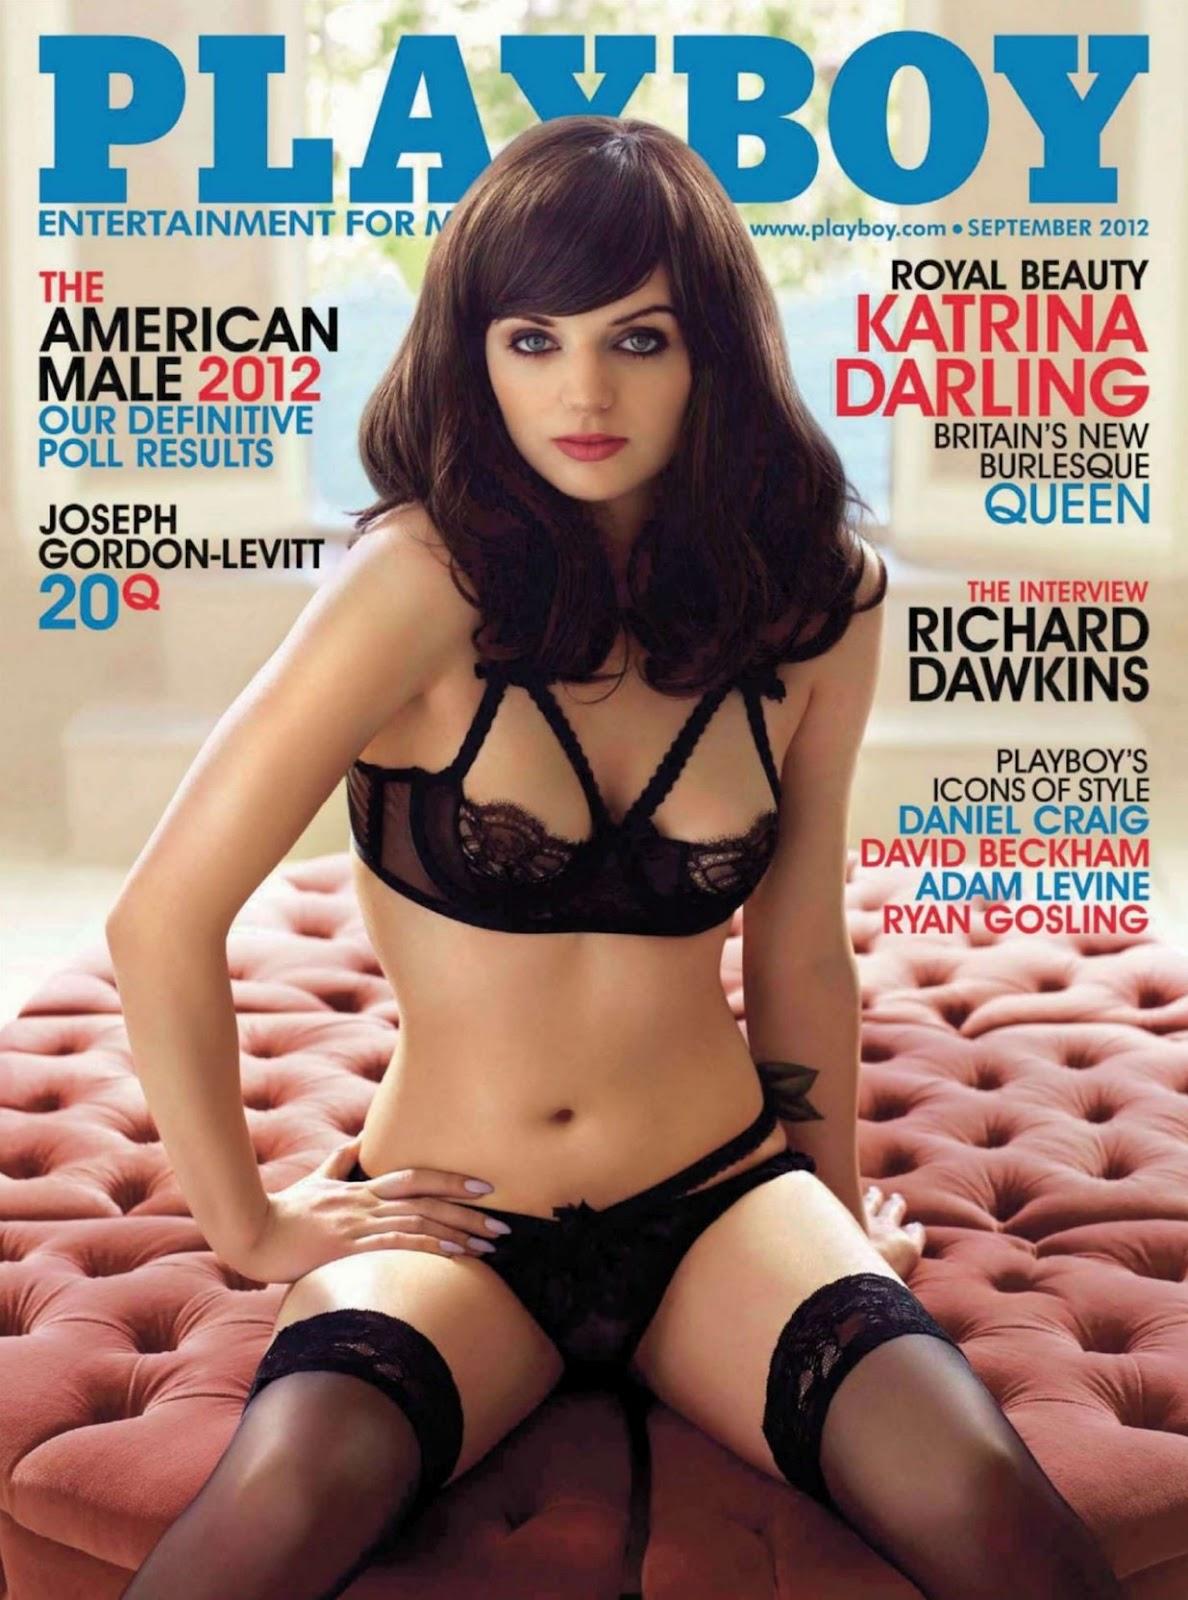 http://4.bp.blogspot.com/-XasfMlNCUgA/UDHo1eH-3pI/AAAAAAAAD2k/MJHSpWQ1Q_E/s1600/Playboy_USA_2012-09-1.jpg